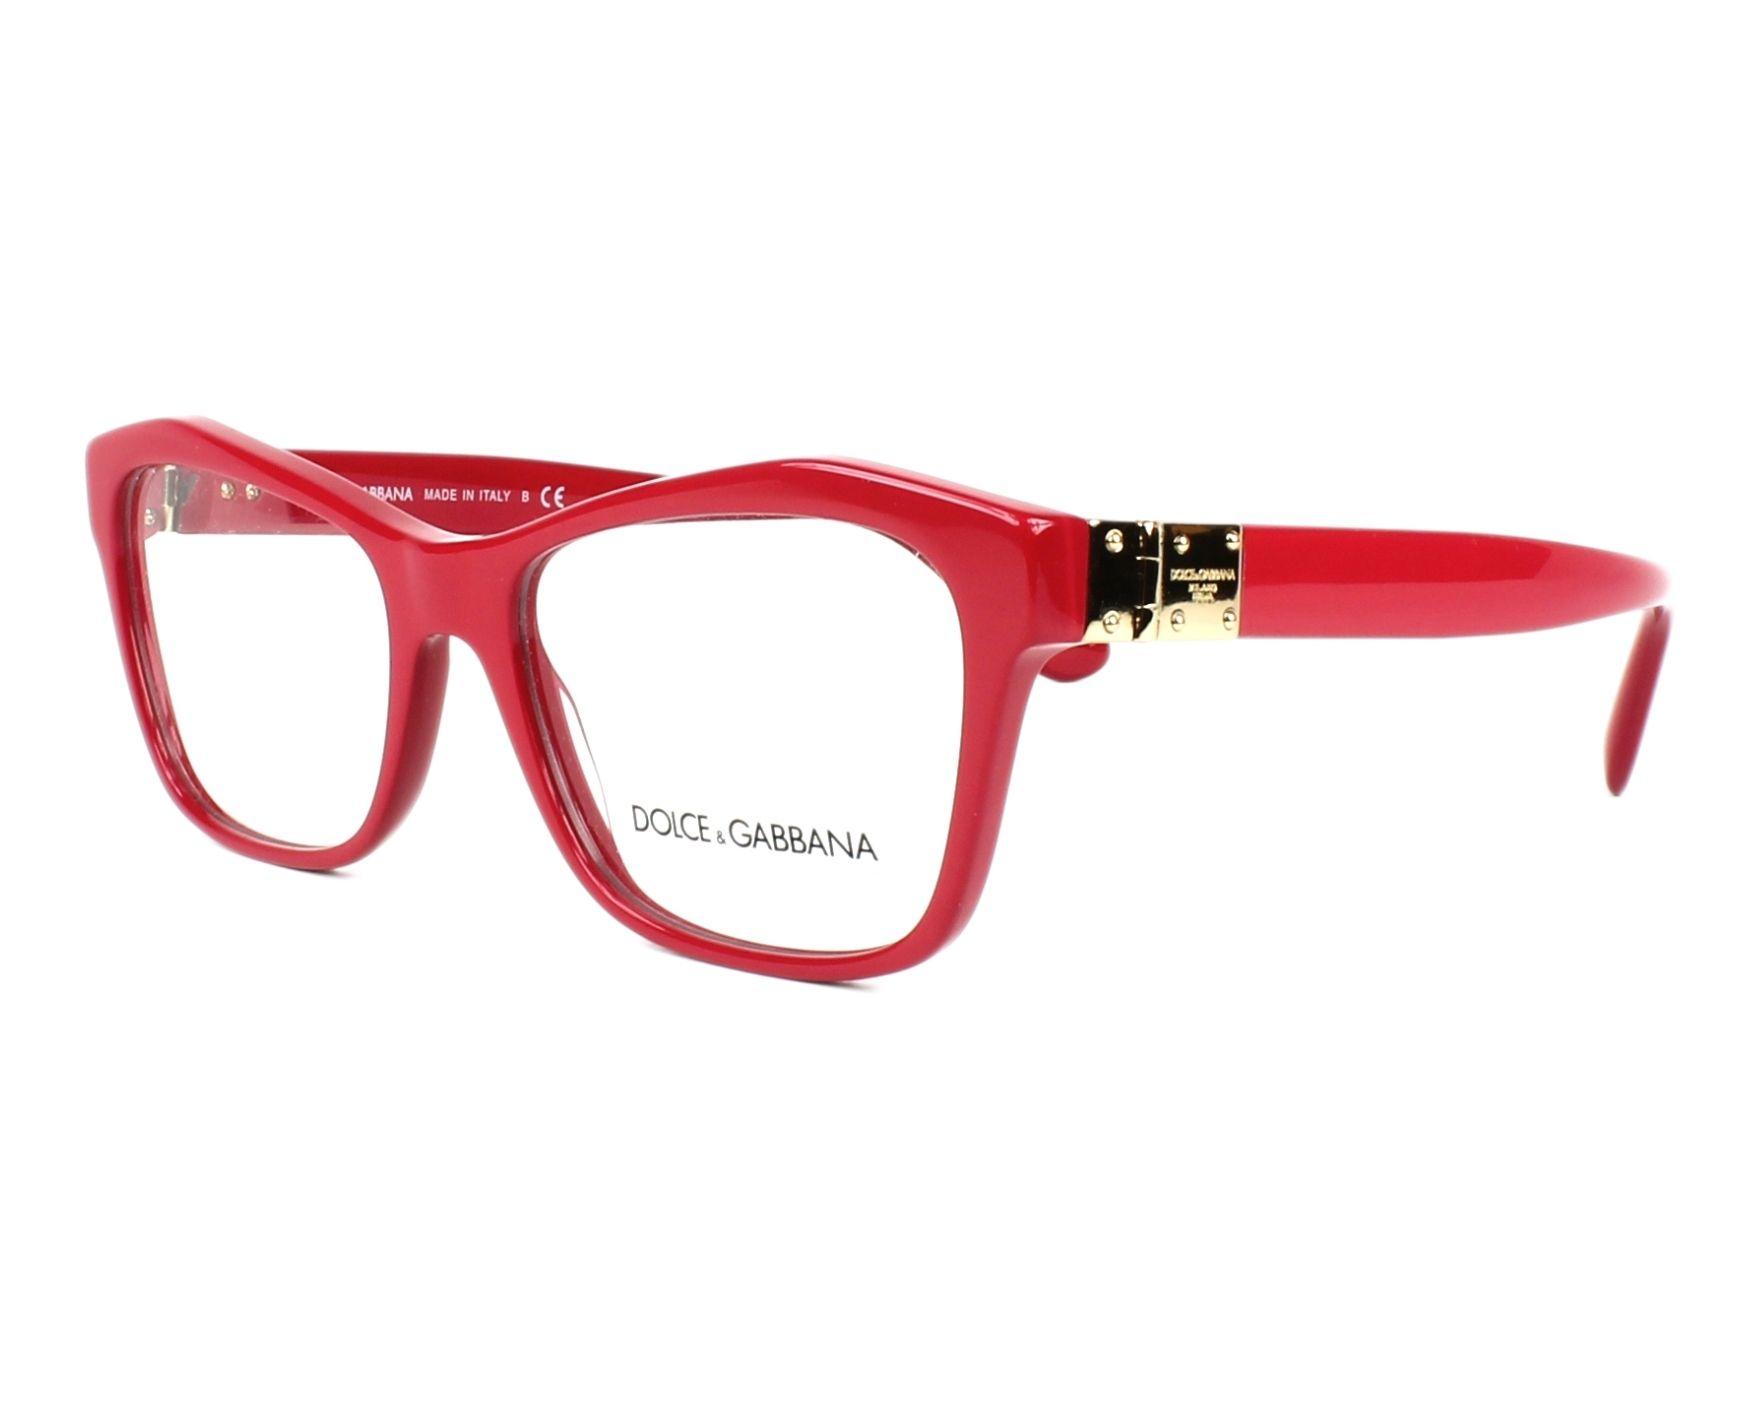 lunettes de vue dolce gabbana dg 3273 3097 fuchsia. Black Bedroom Furniture Sets. Home Design Ideas